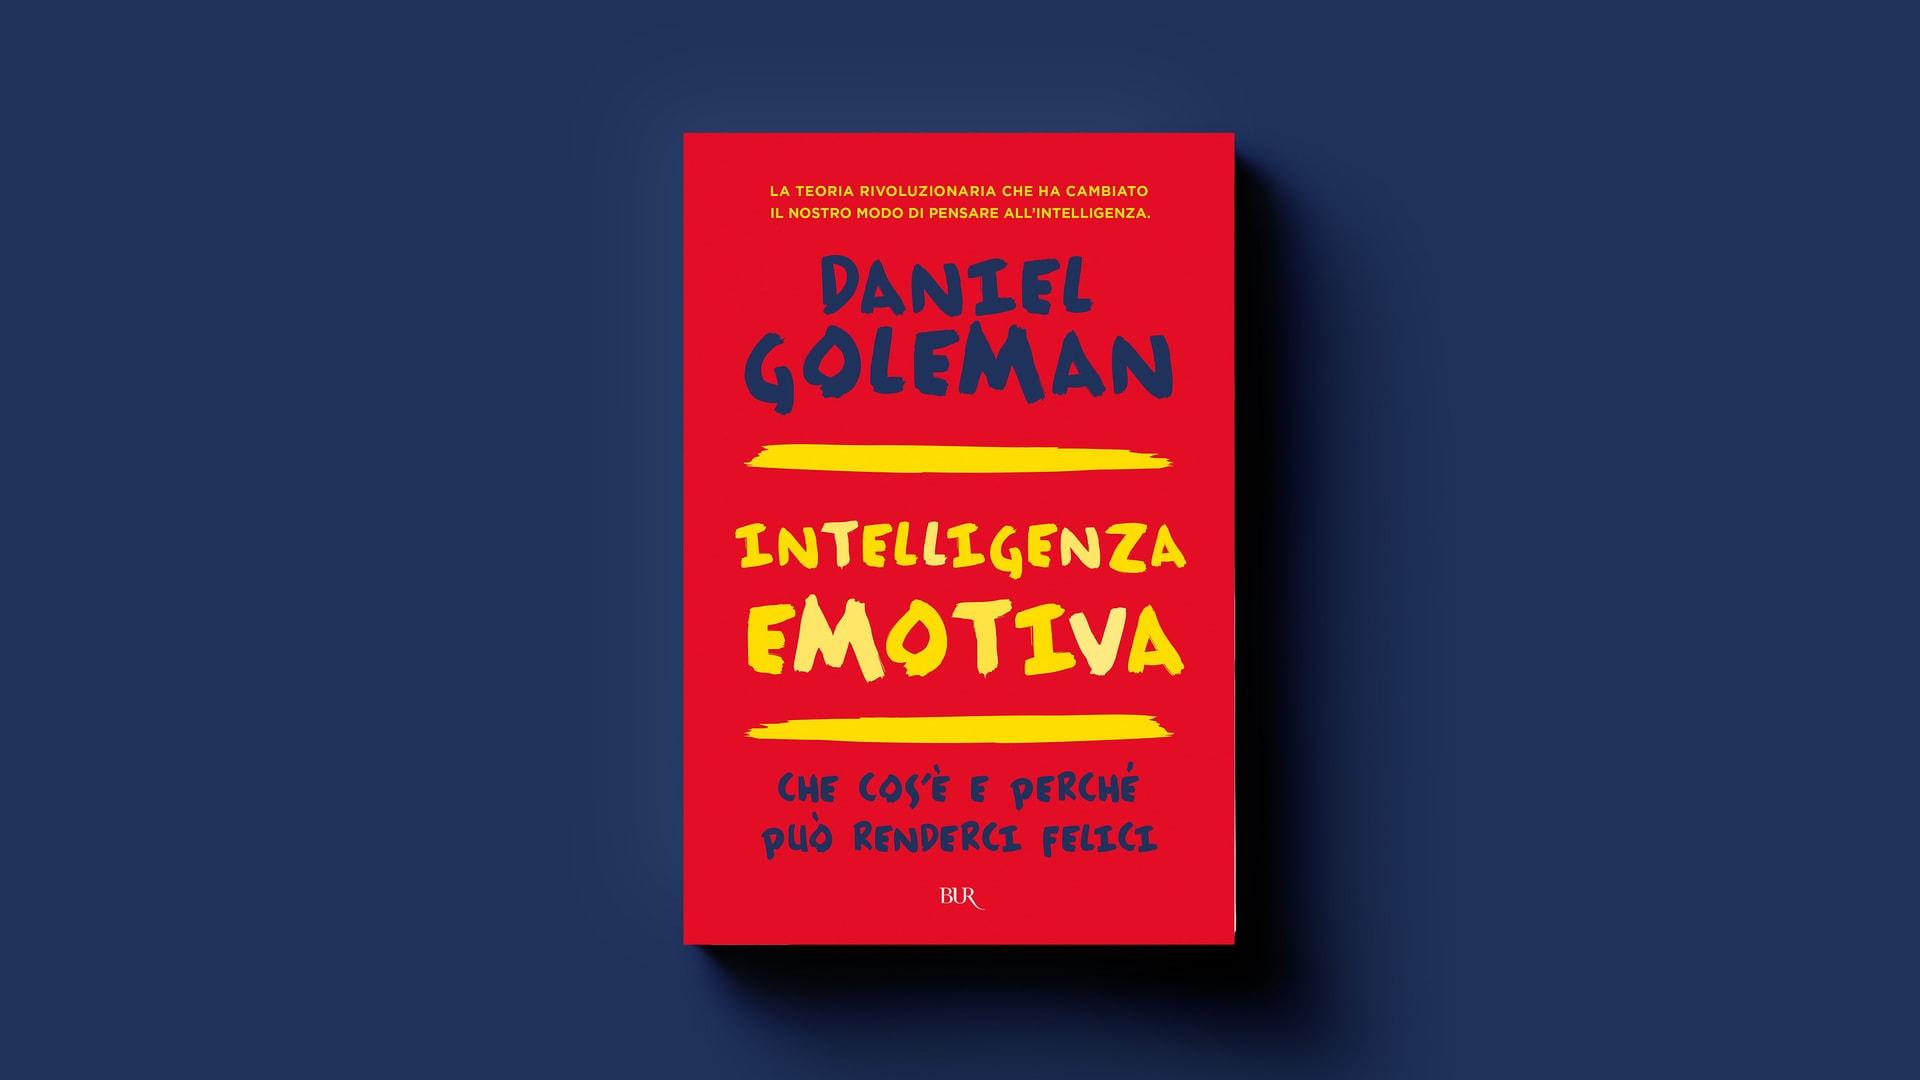 copertina intelligenza emotiva goleman